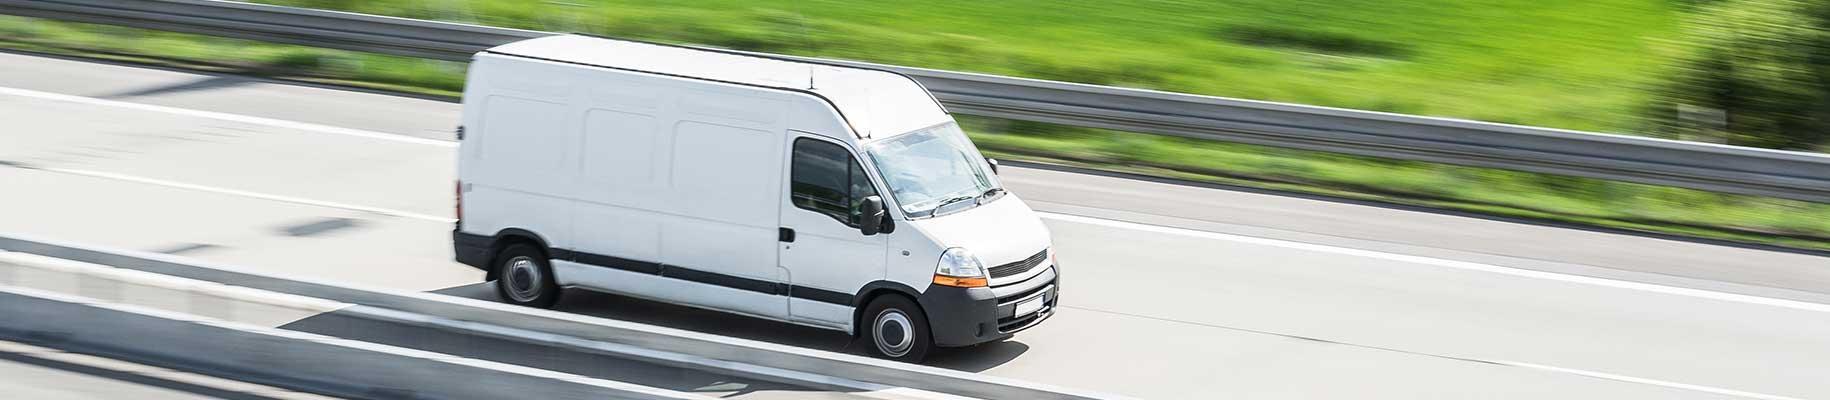 Delivery van on motorway